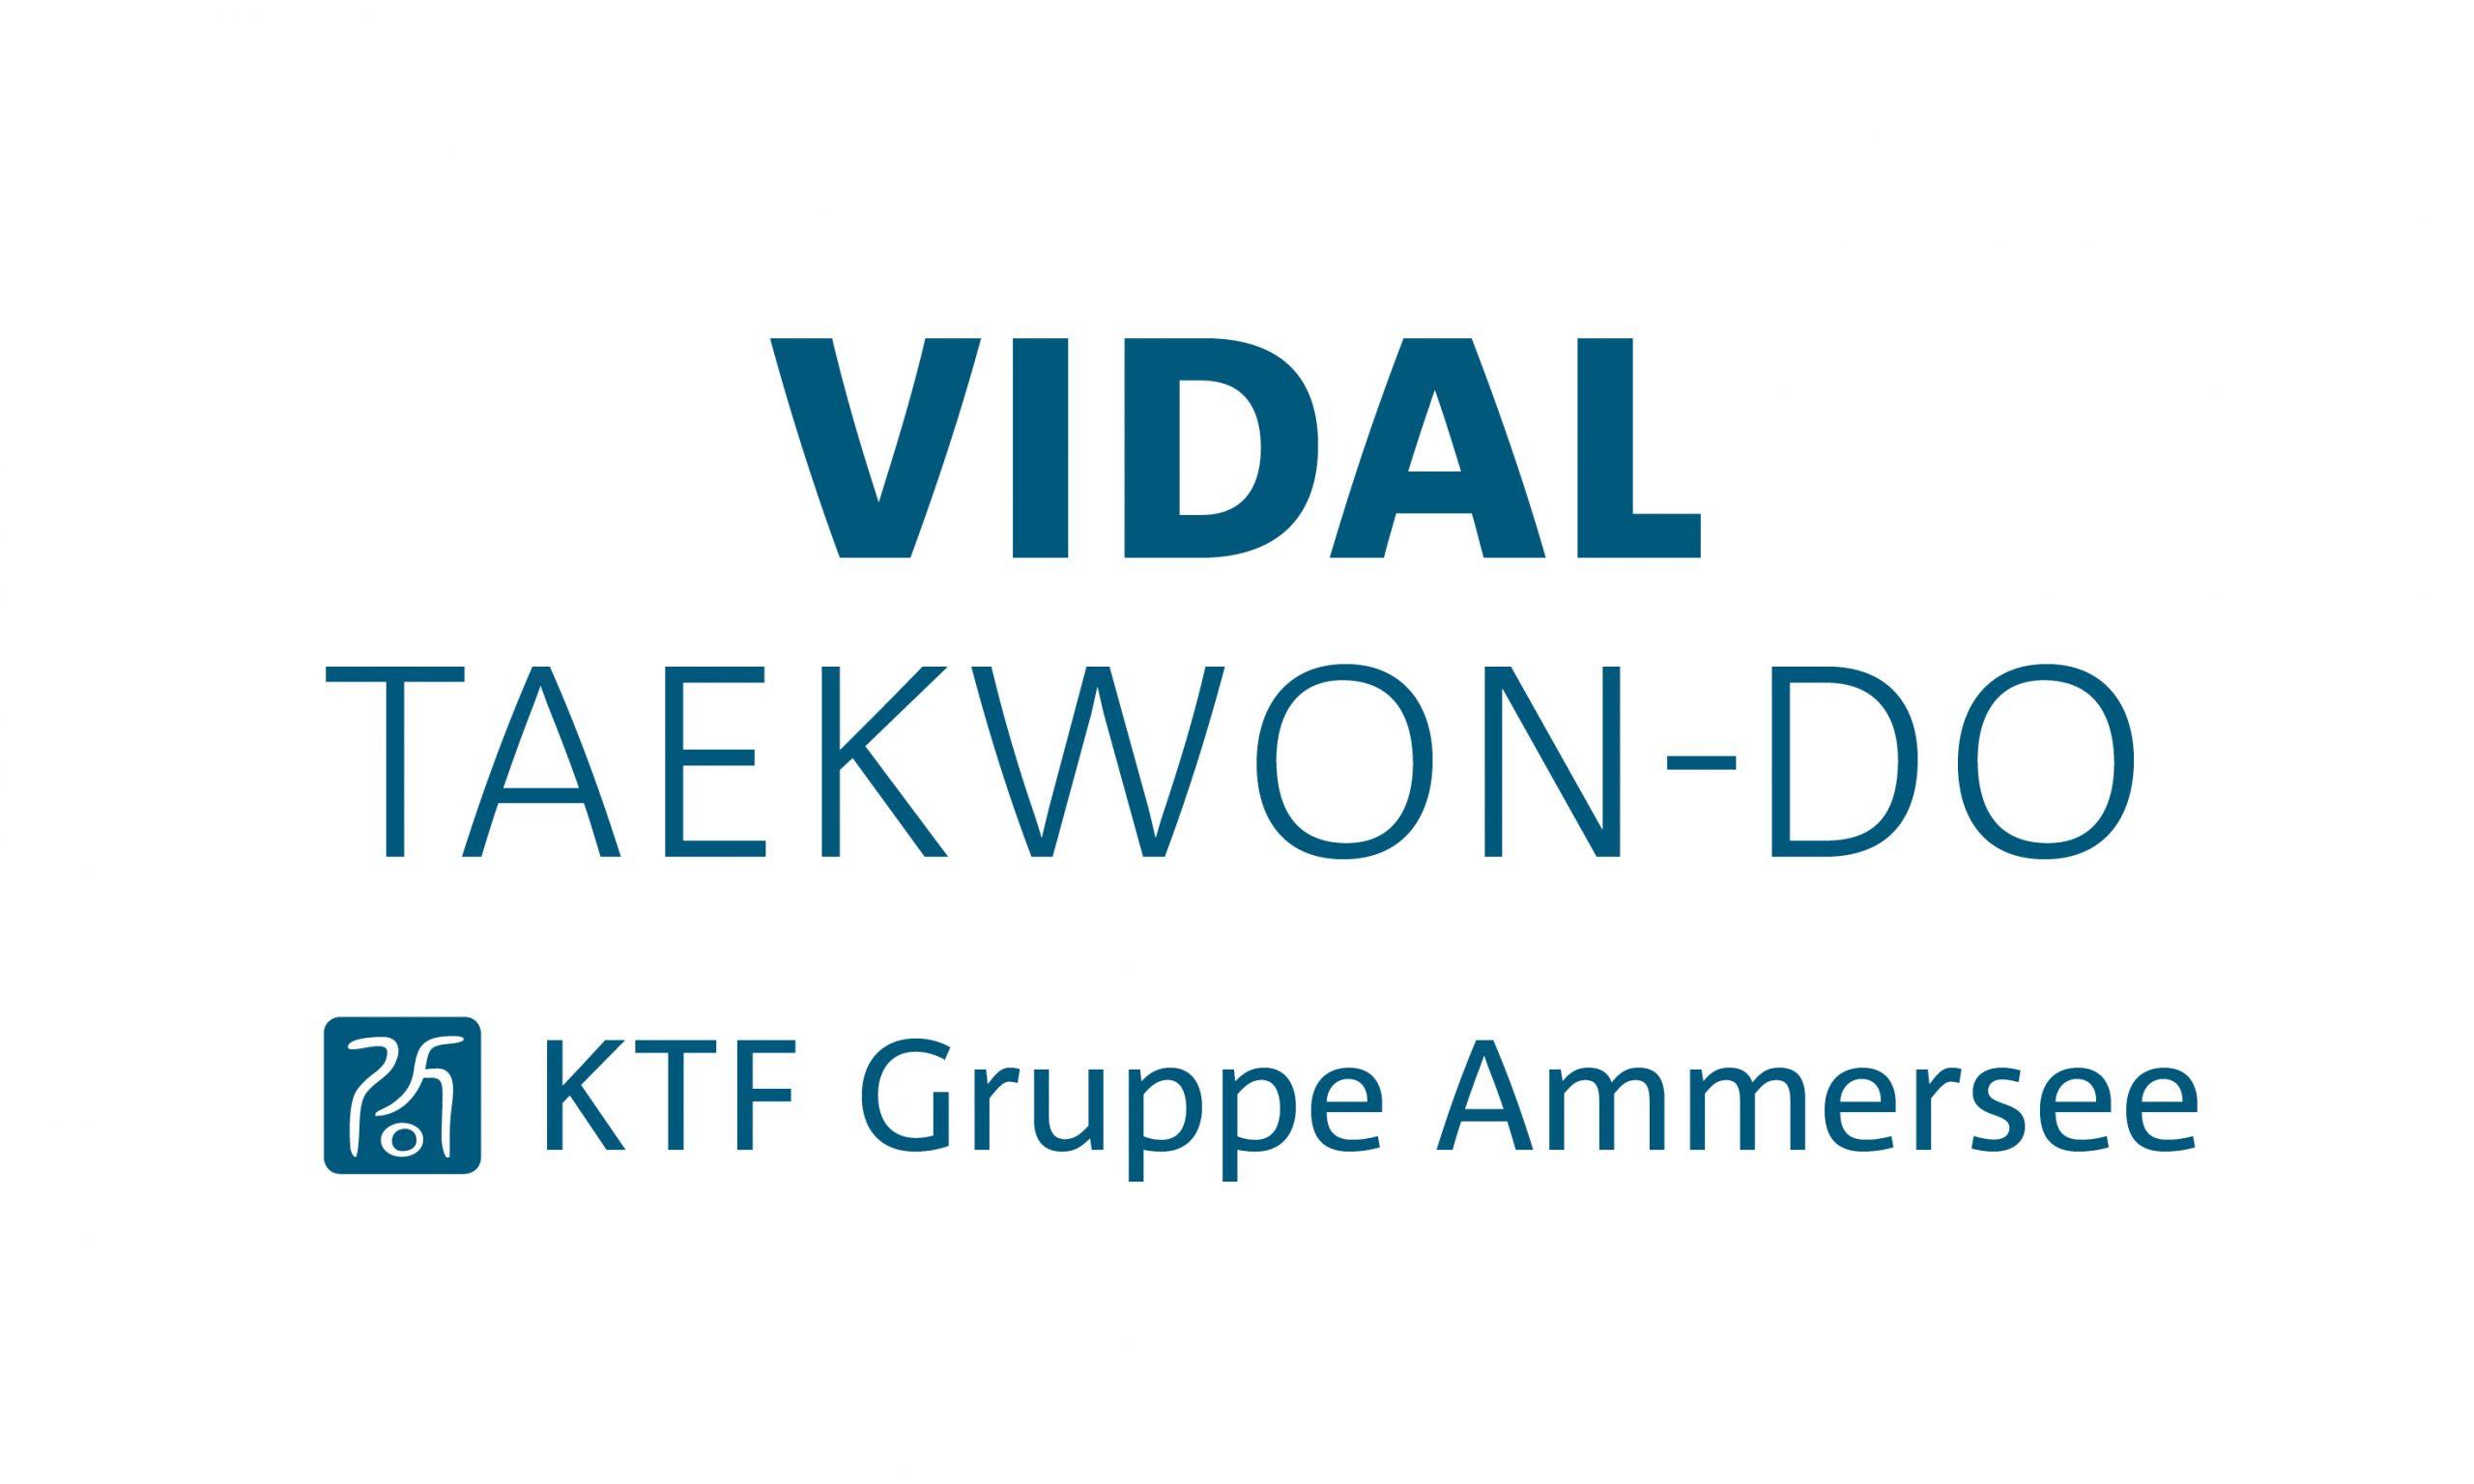 VIDAL TAEKWON-DO AMMERSEE